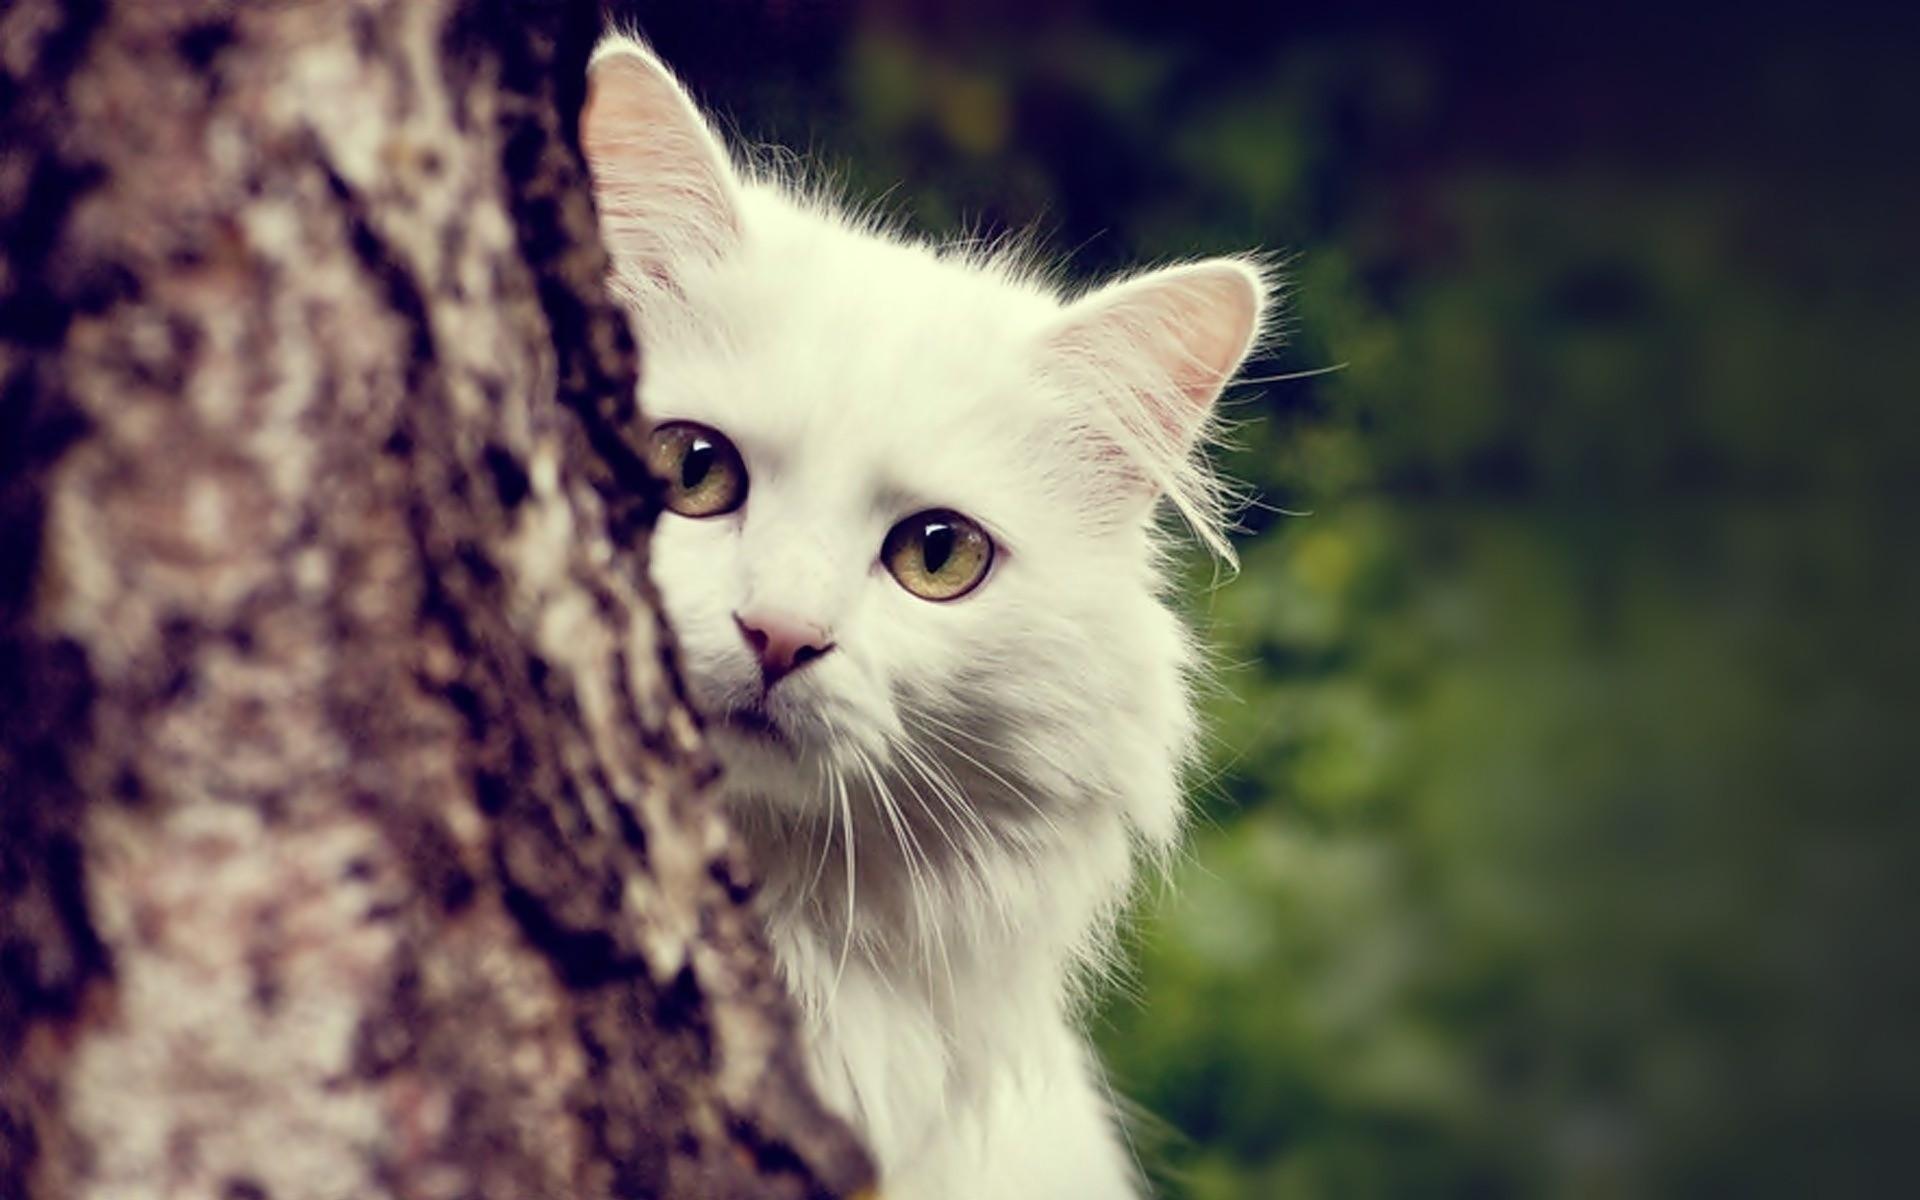 Stunning Cute Cat Hd Wallpapers Te Beautiful Cute Cats Wallpapers Hd Pictures Live Hd Wallpaper 1920x1200